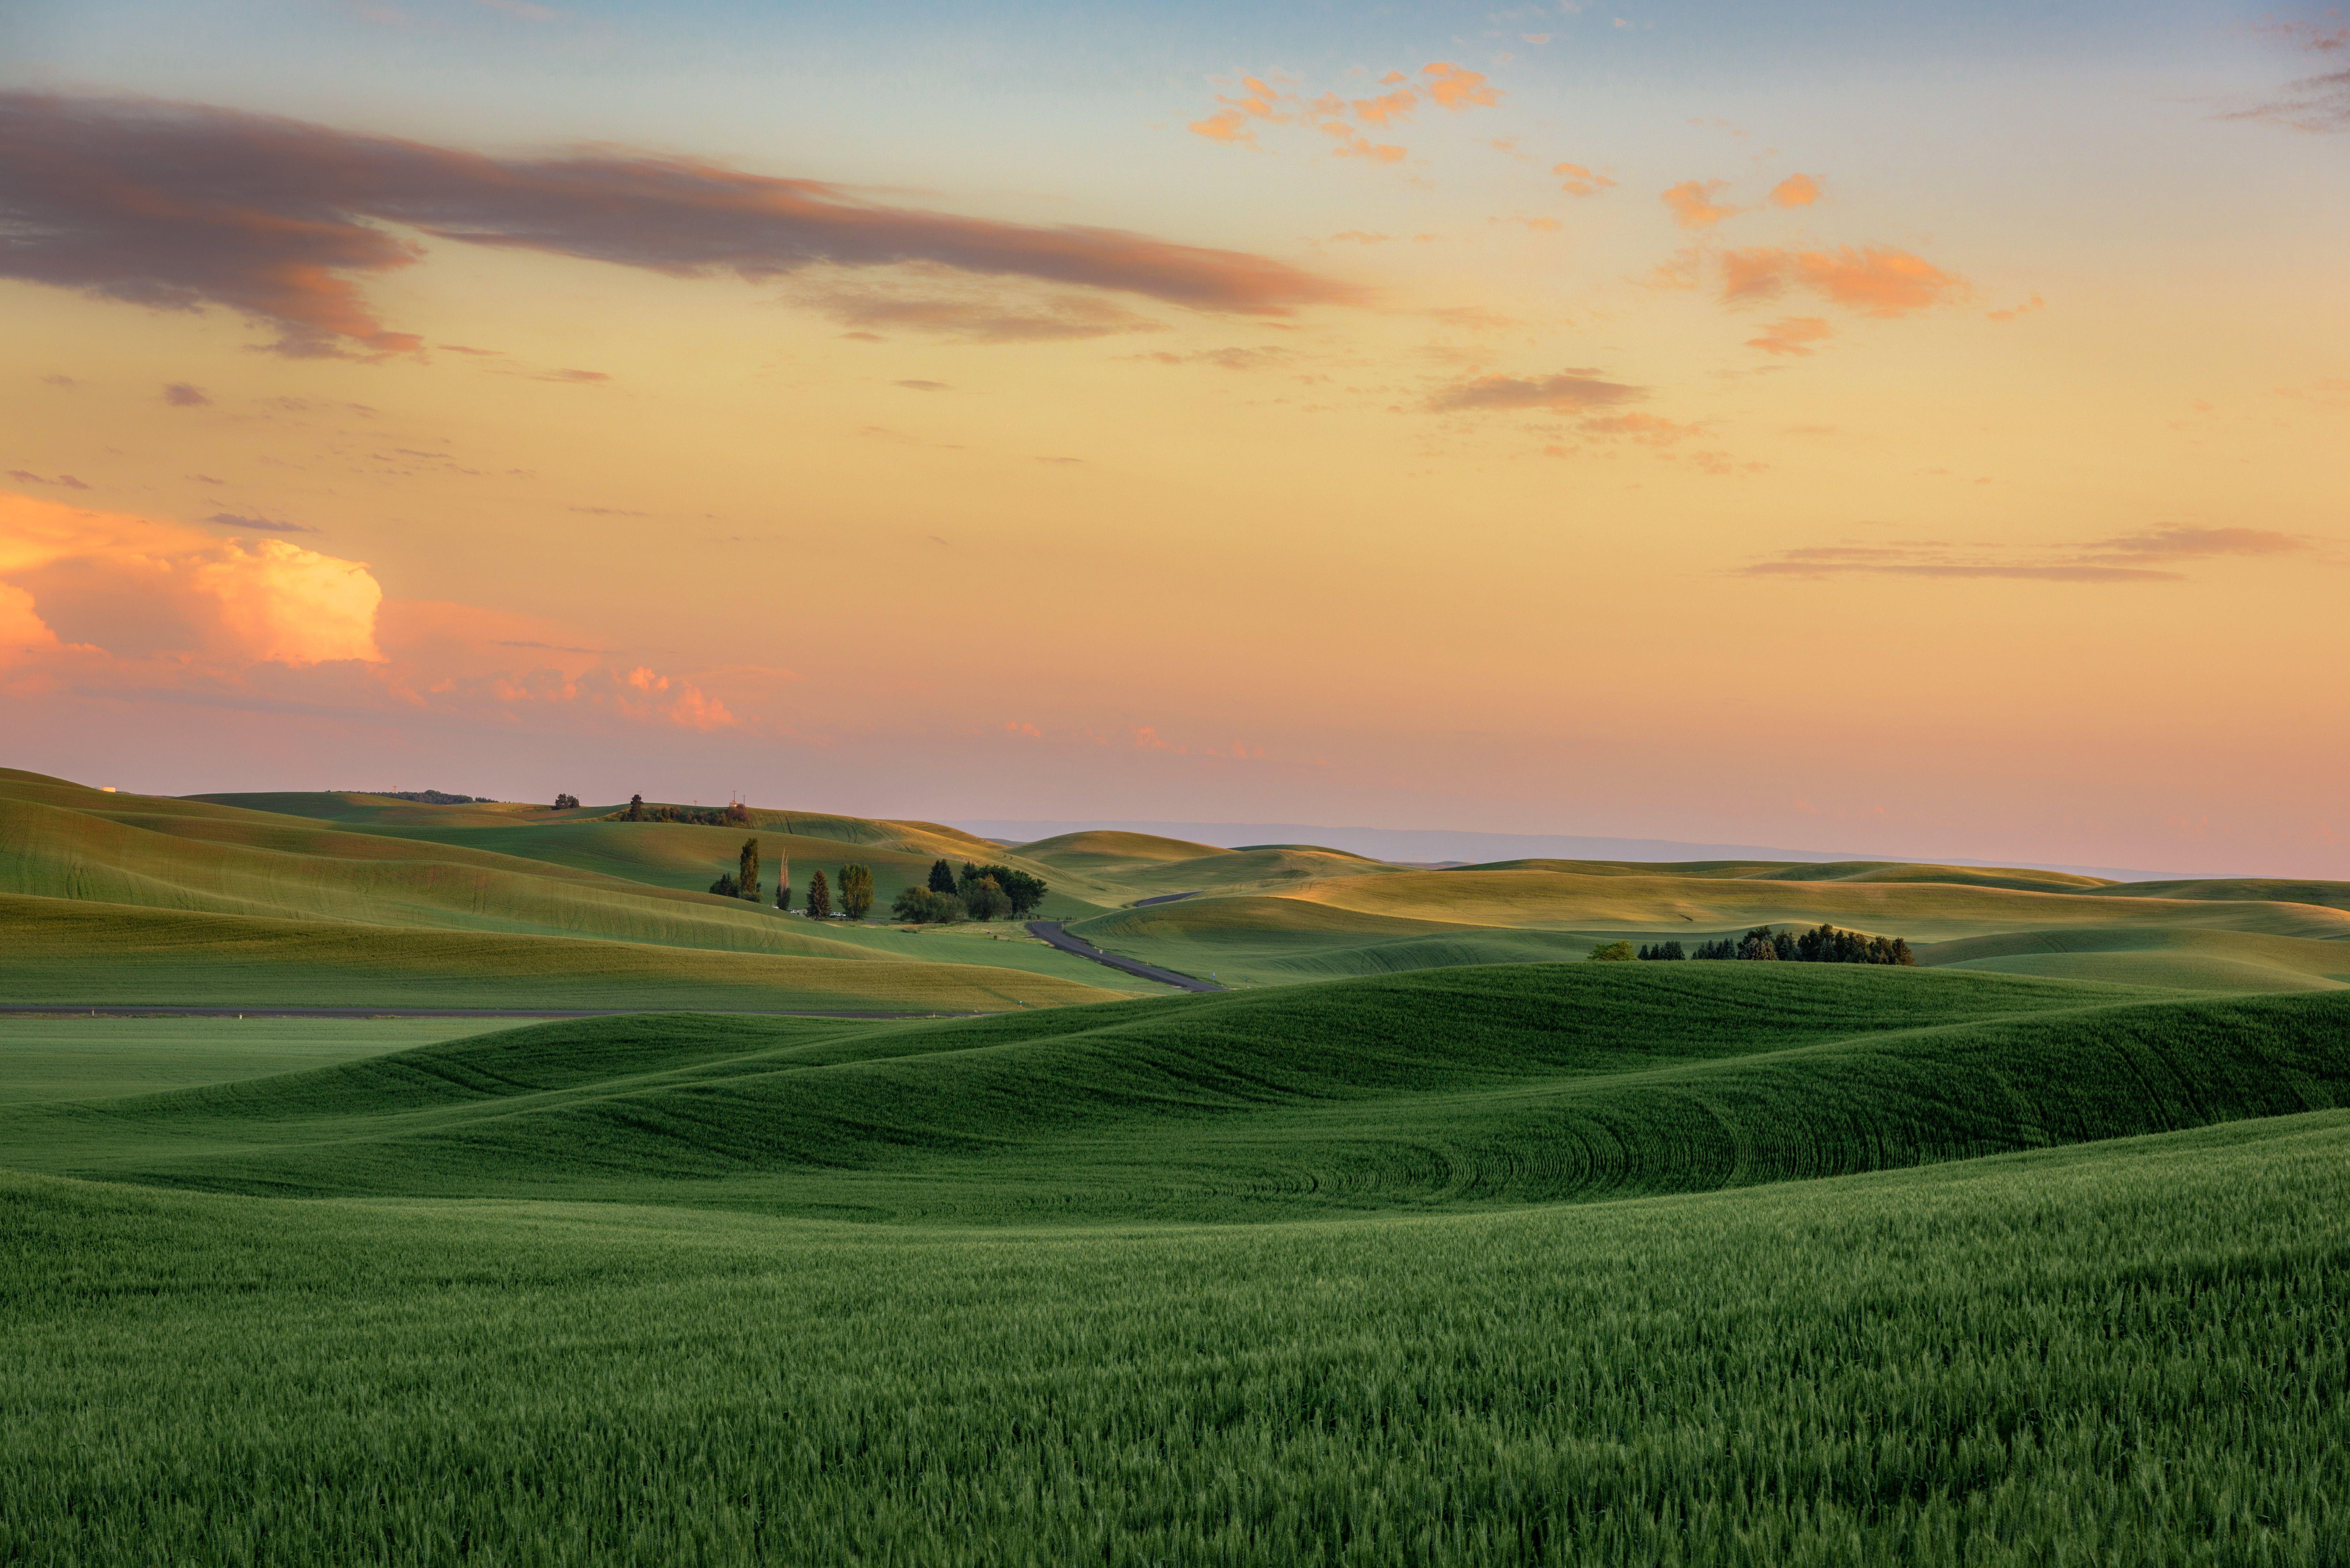 shallow focus photography of green grass field under